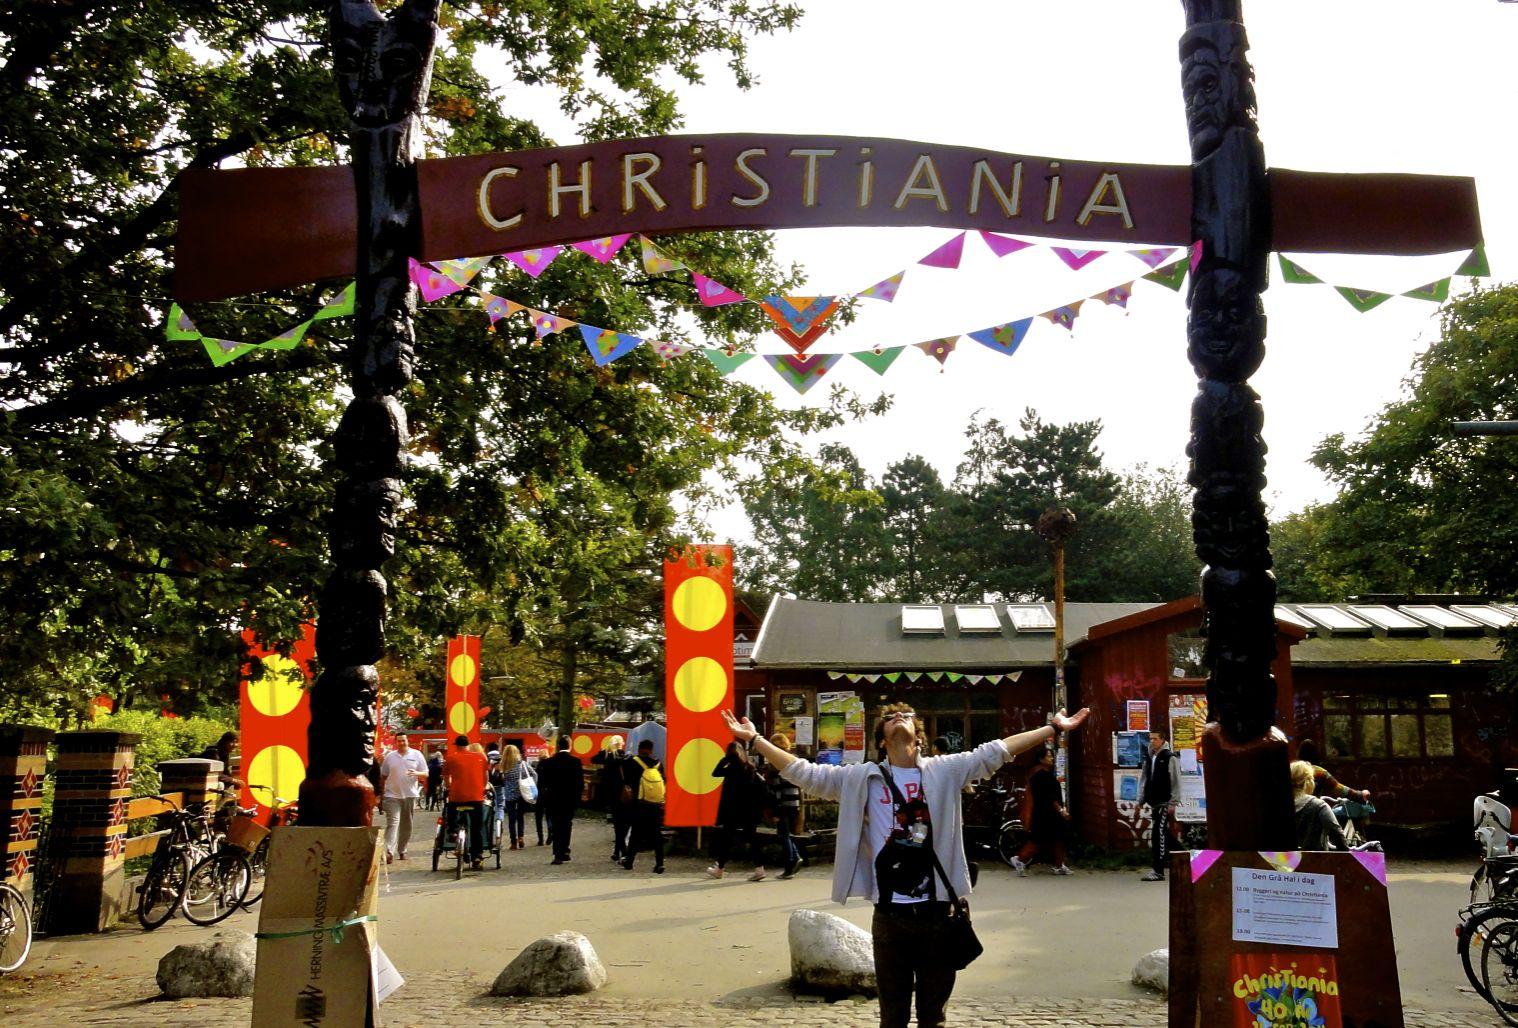 Experience et c tera visite guid e de christiania freetown de copenhague - Office tourisme copenhague ...